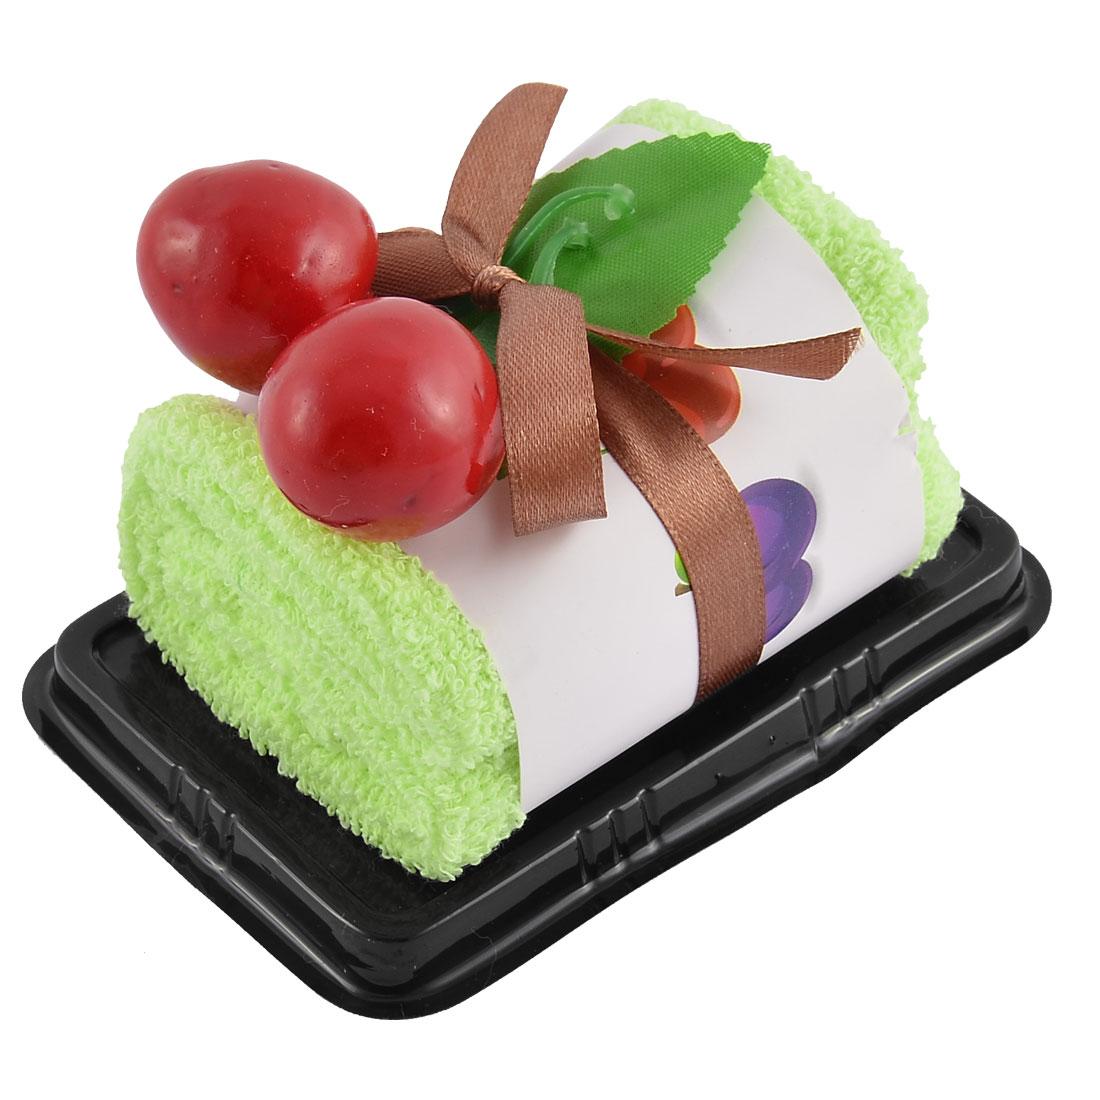 Plastic Simulated Cherry Decor Square Roll Cake Towel Gift Ornament Green